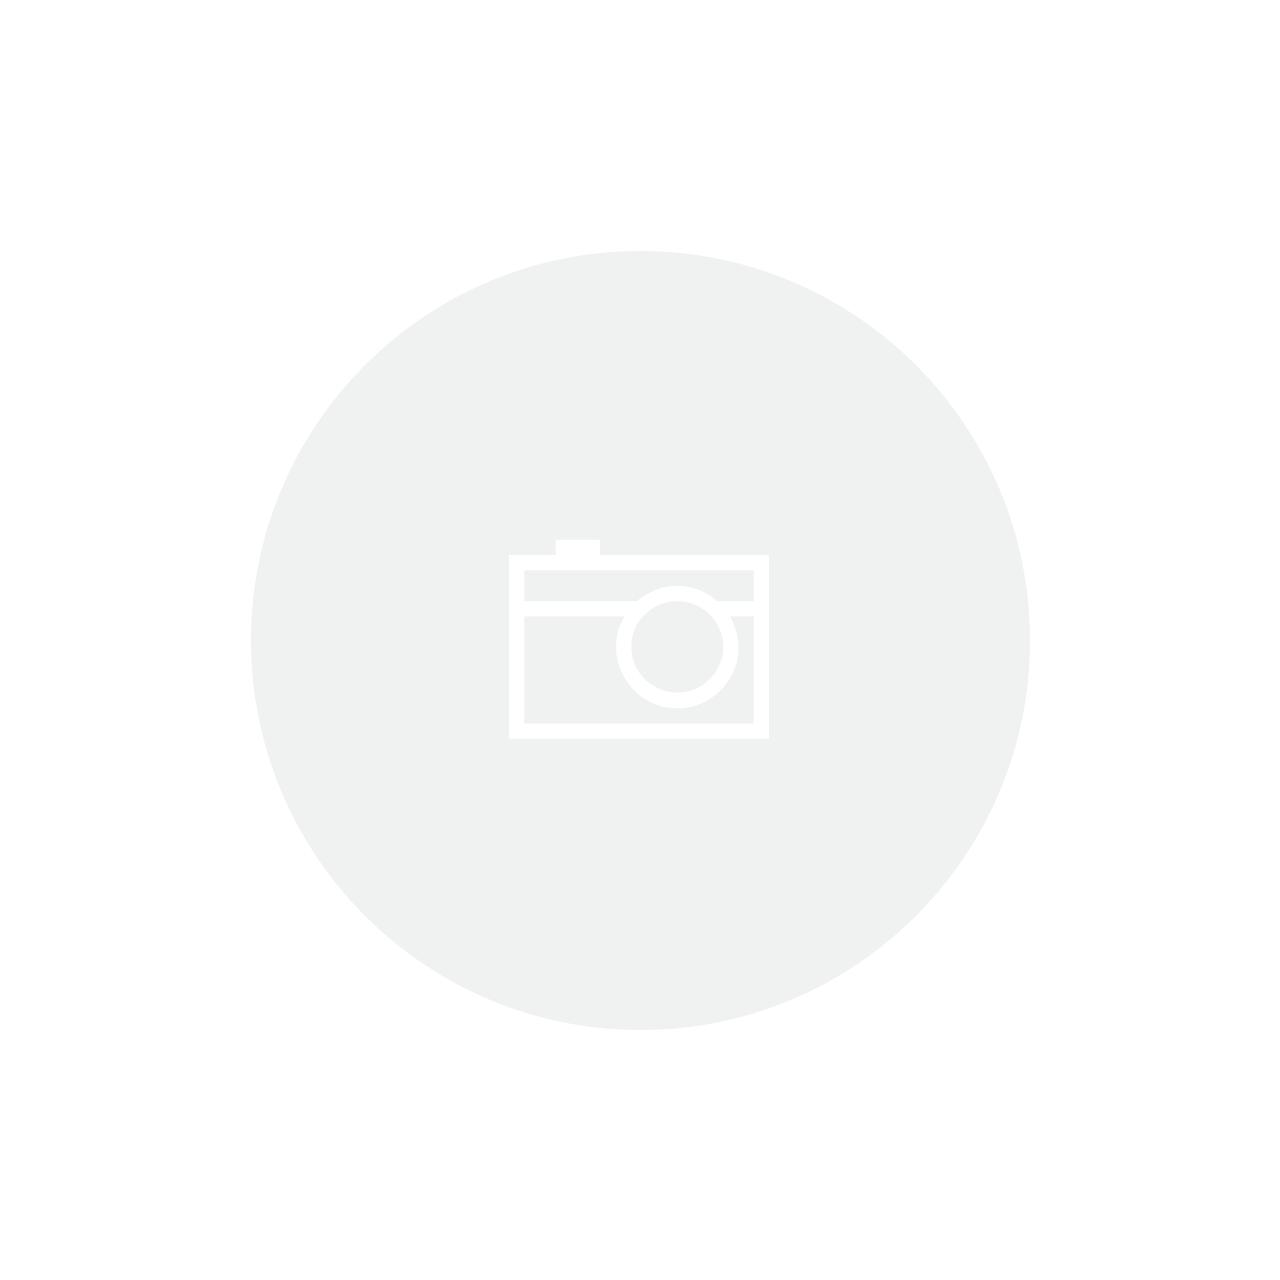 Panela com Cabo Inox 20cm 2,70 Litros Allegra Tramontina